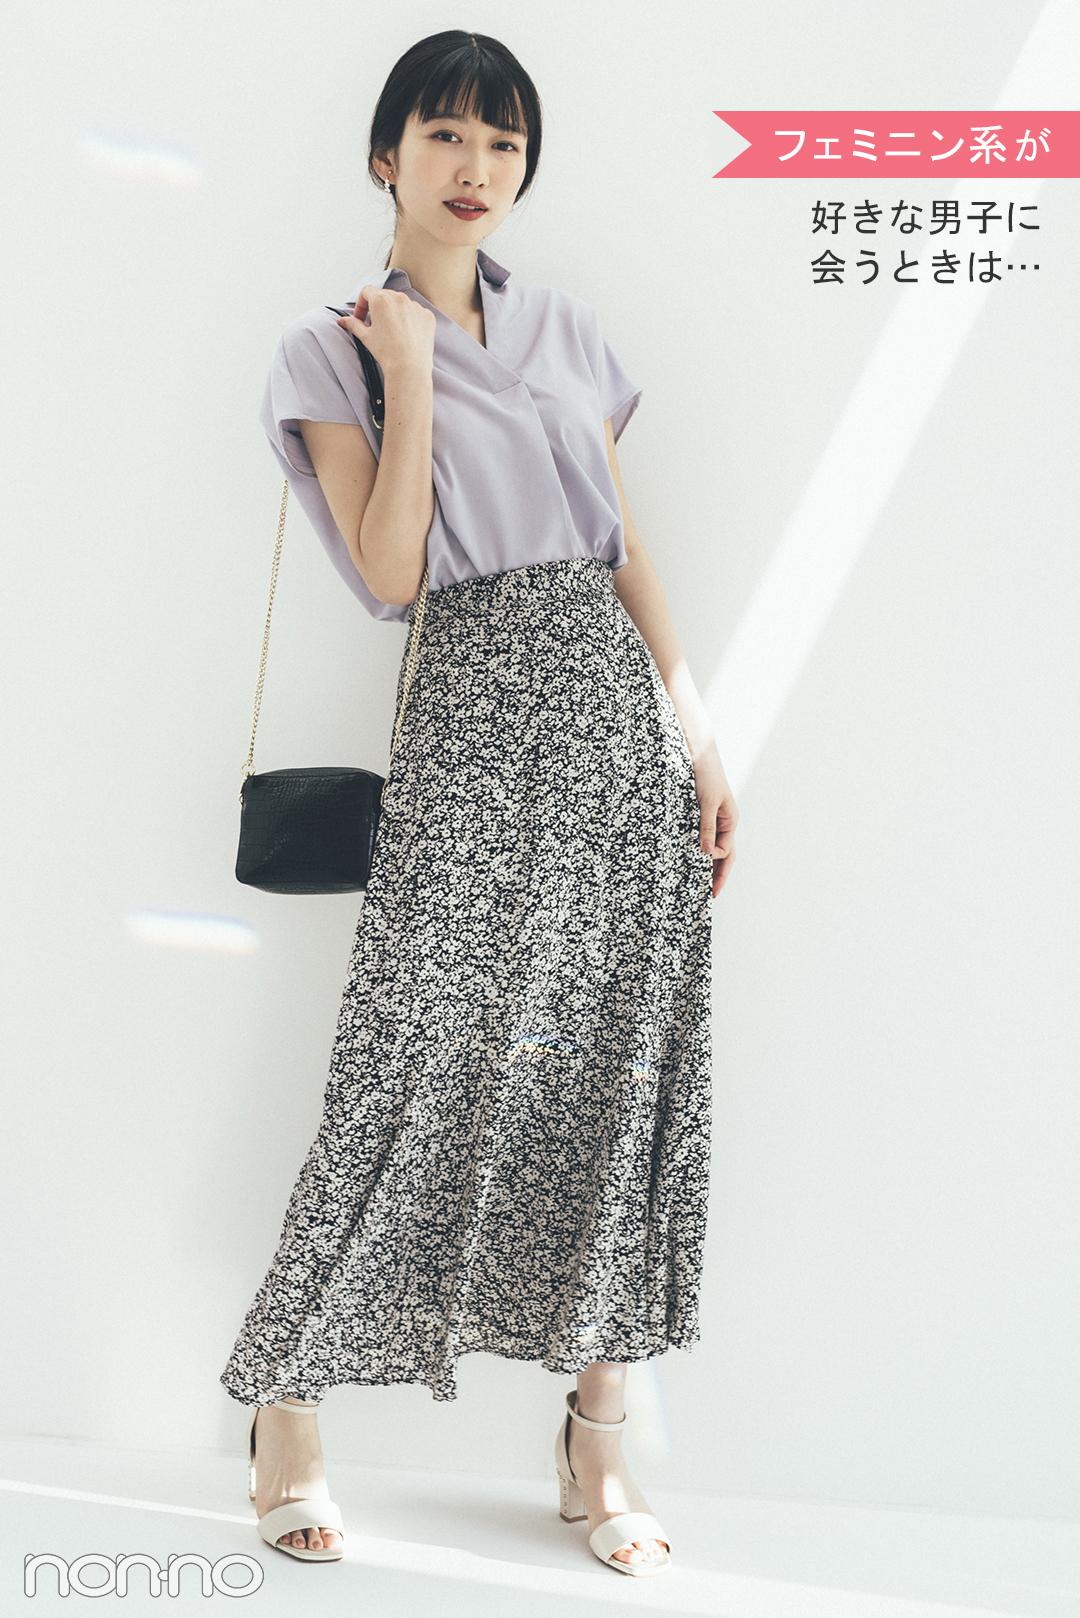 ITEM2 上品な印象に仕上がる スキッパーシャツ 「フェミニン系」が好きな男子に会うときは 岡本夏美